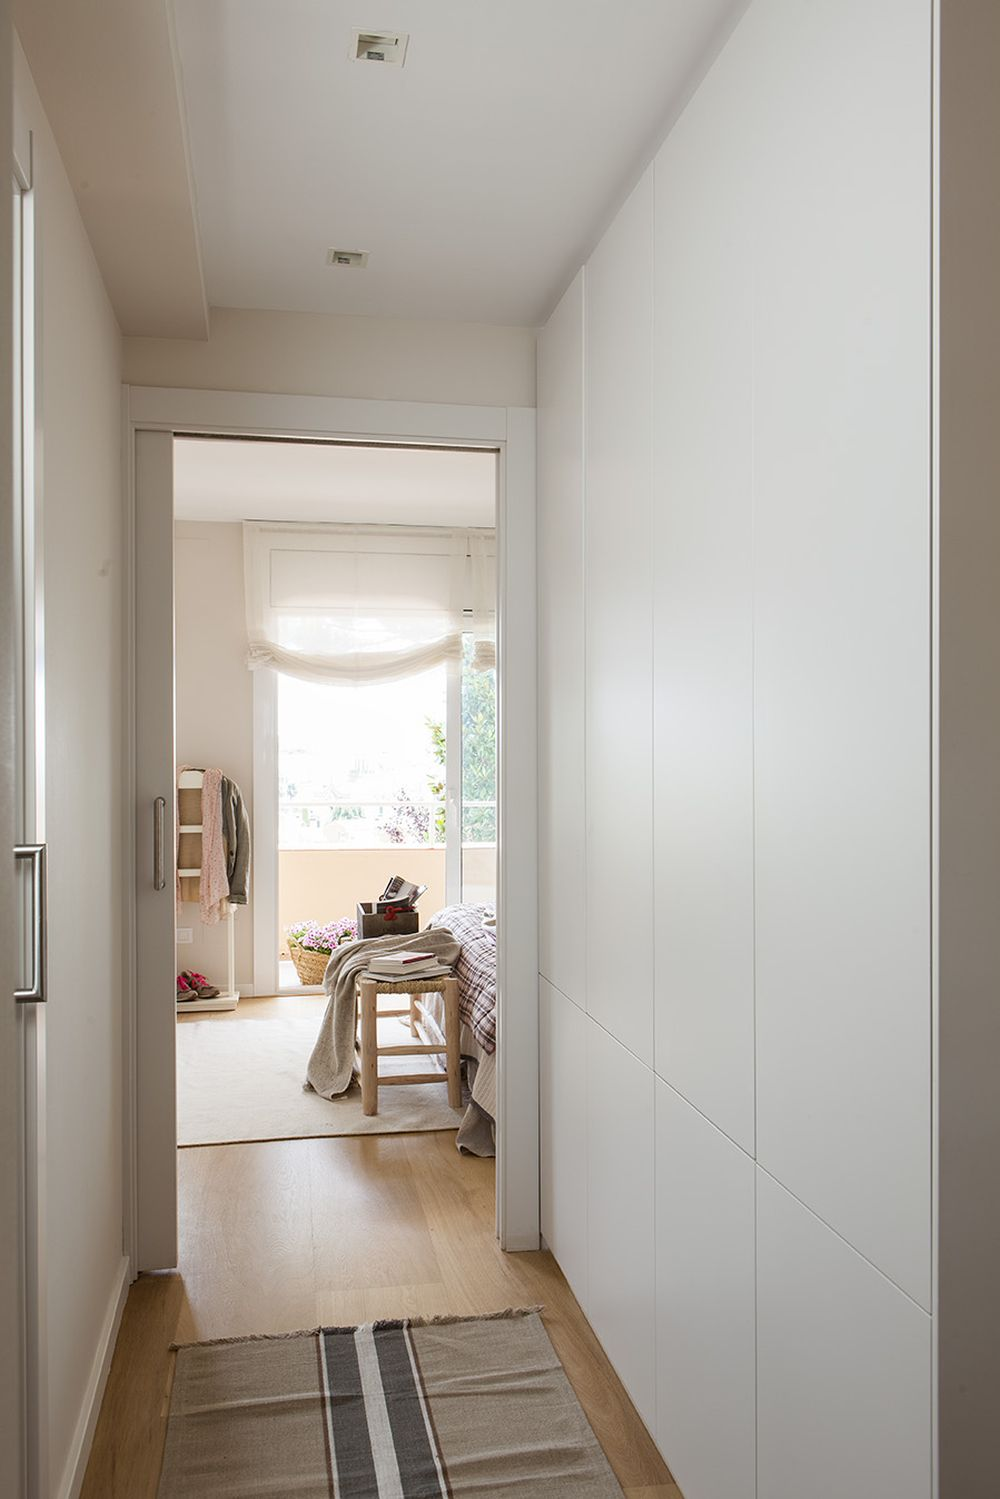 adelaparvu.com despre casa cu gradina, accente marine, designer Jeanette Dresing, Foto Feran Freixa (17)